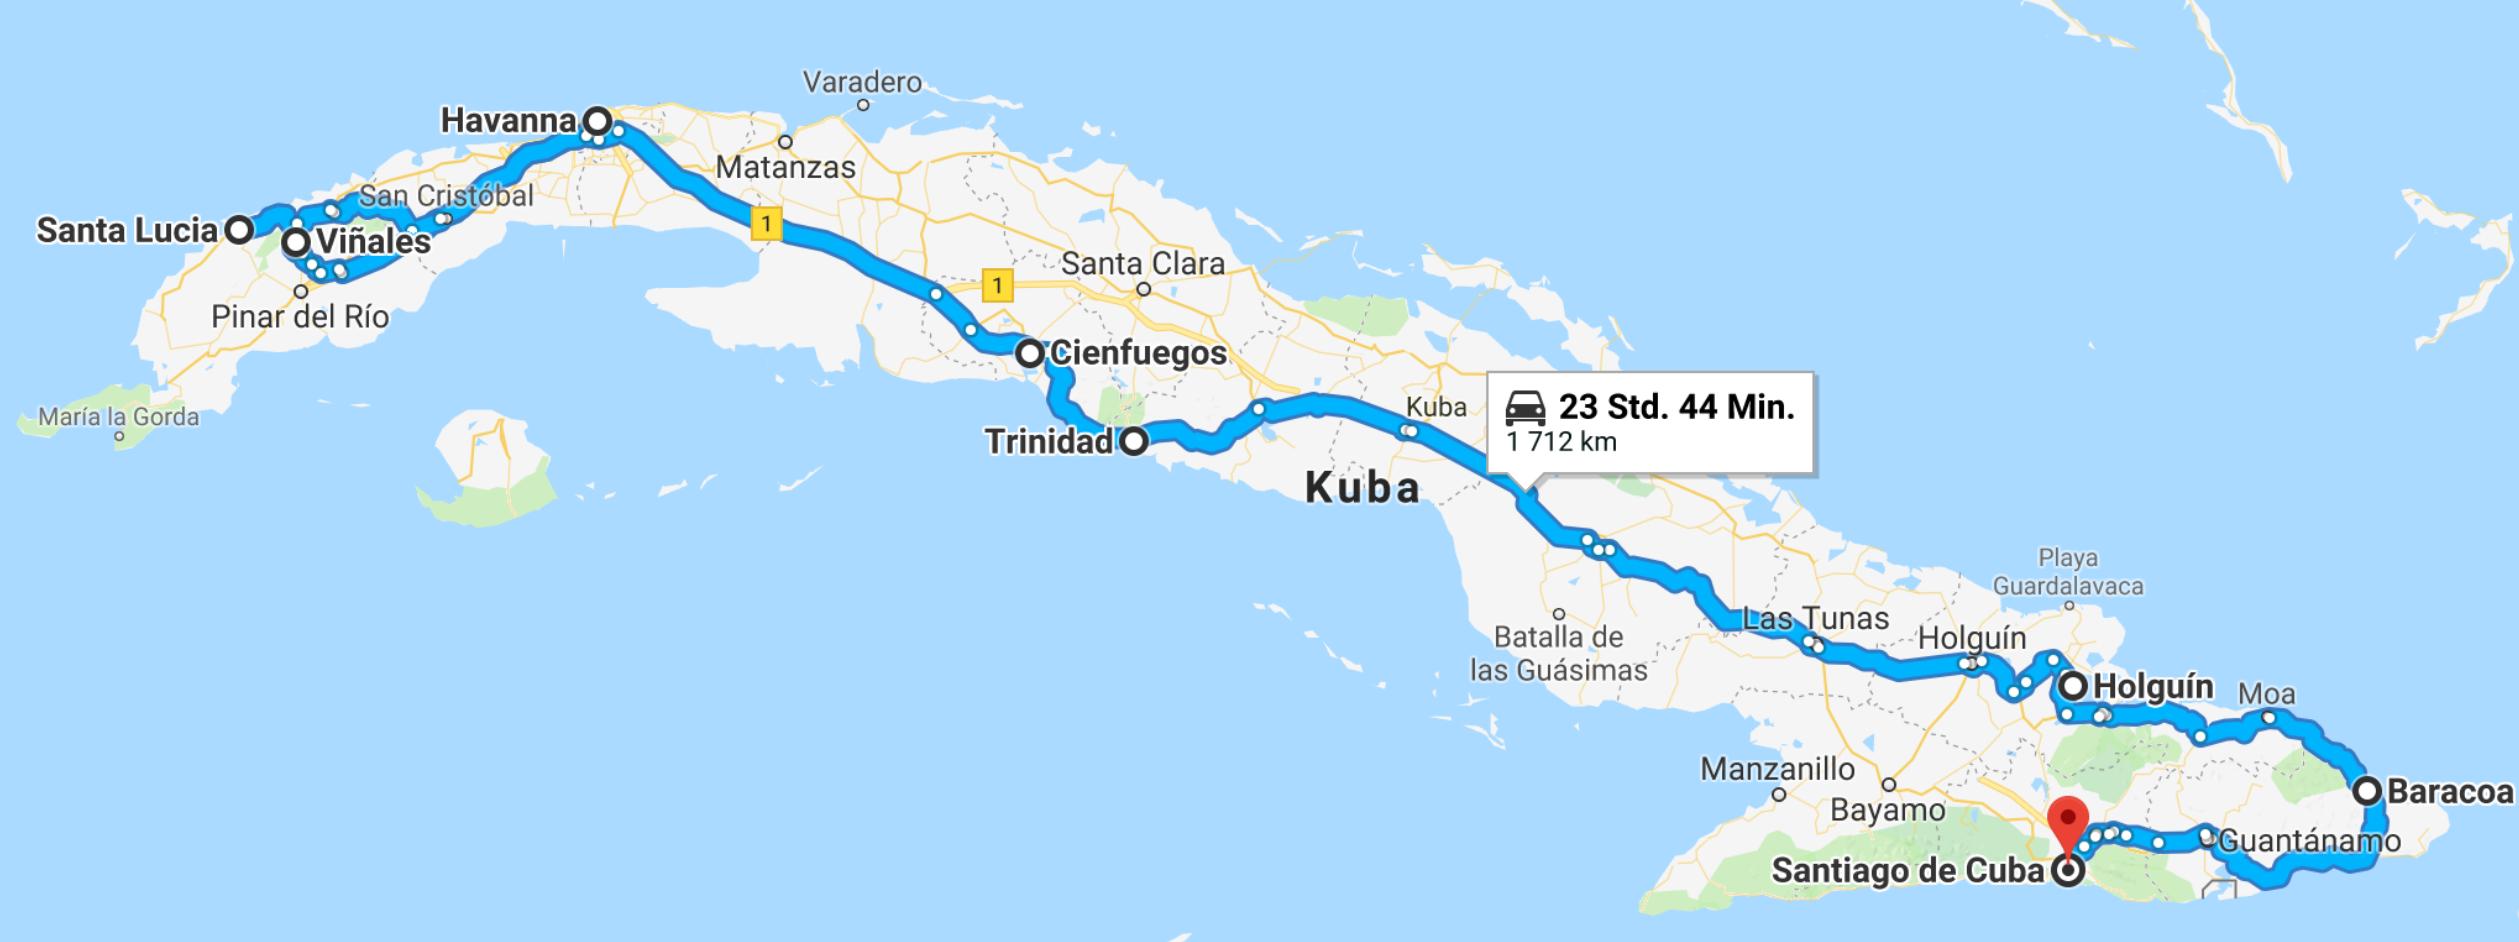 Reiseroute mit dem Auto Kuba 2017